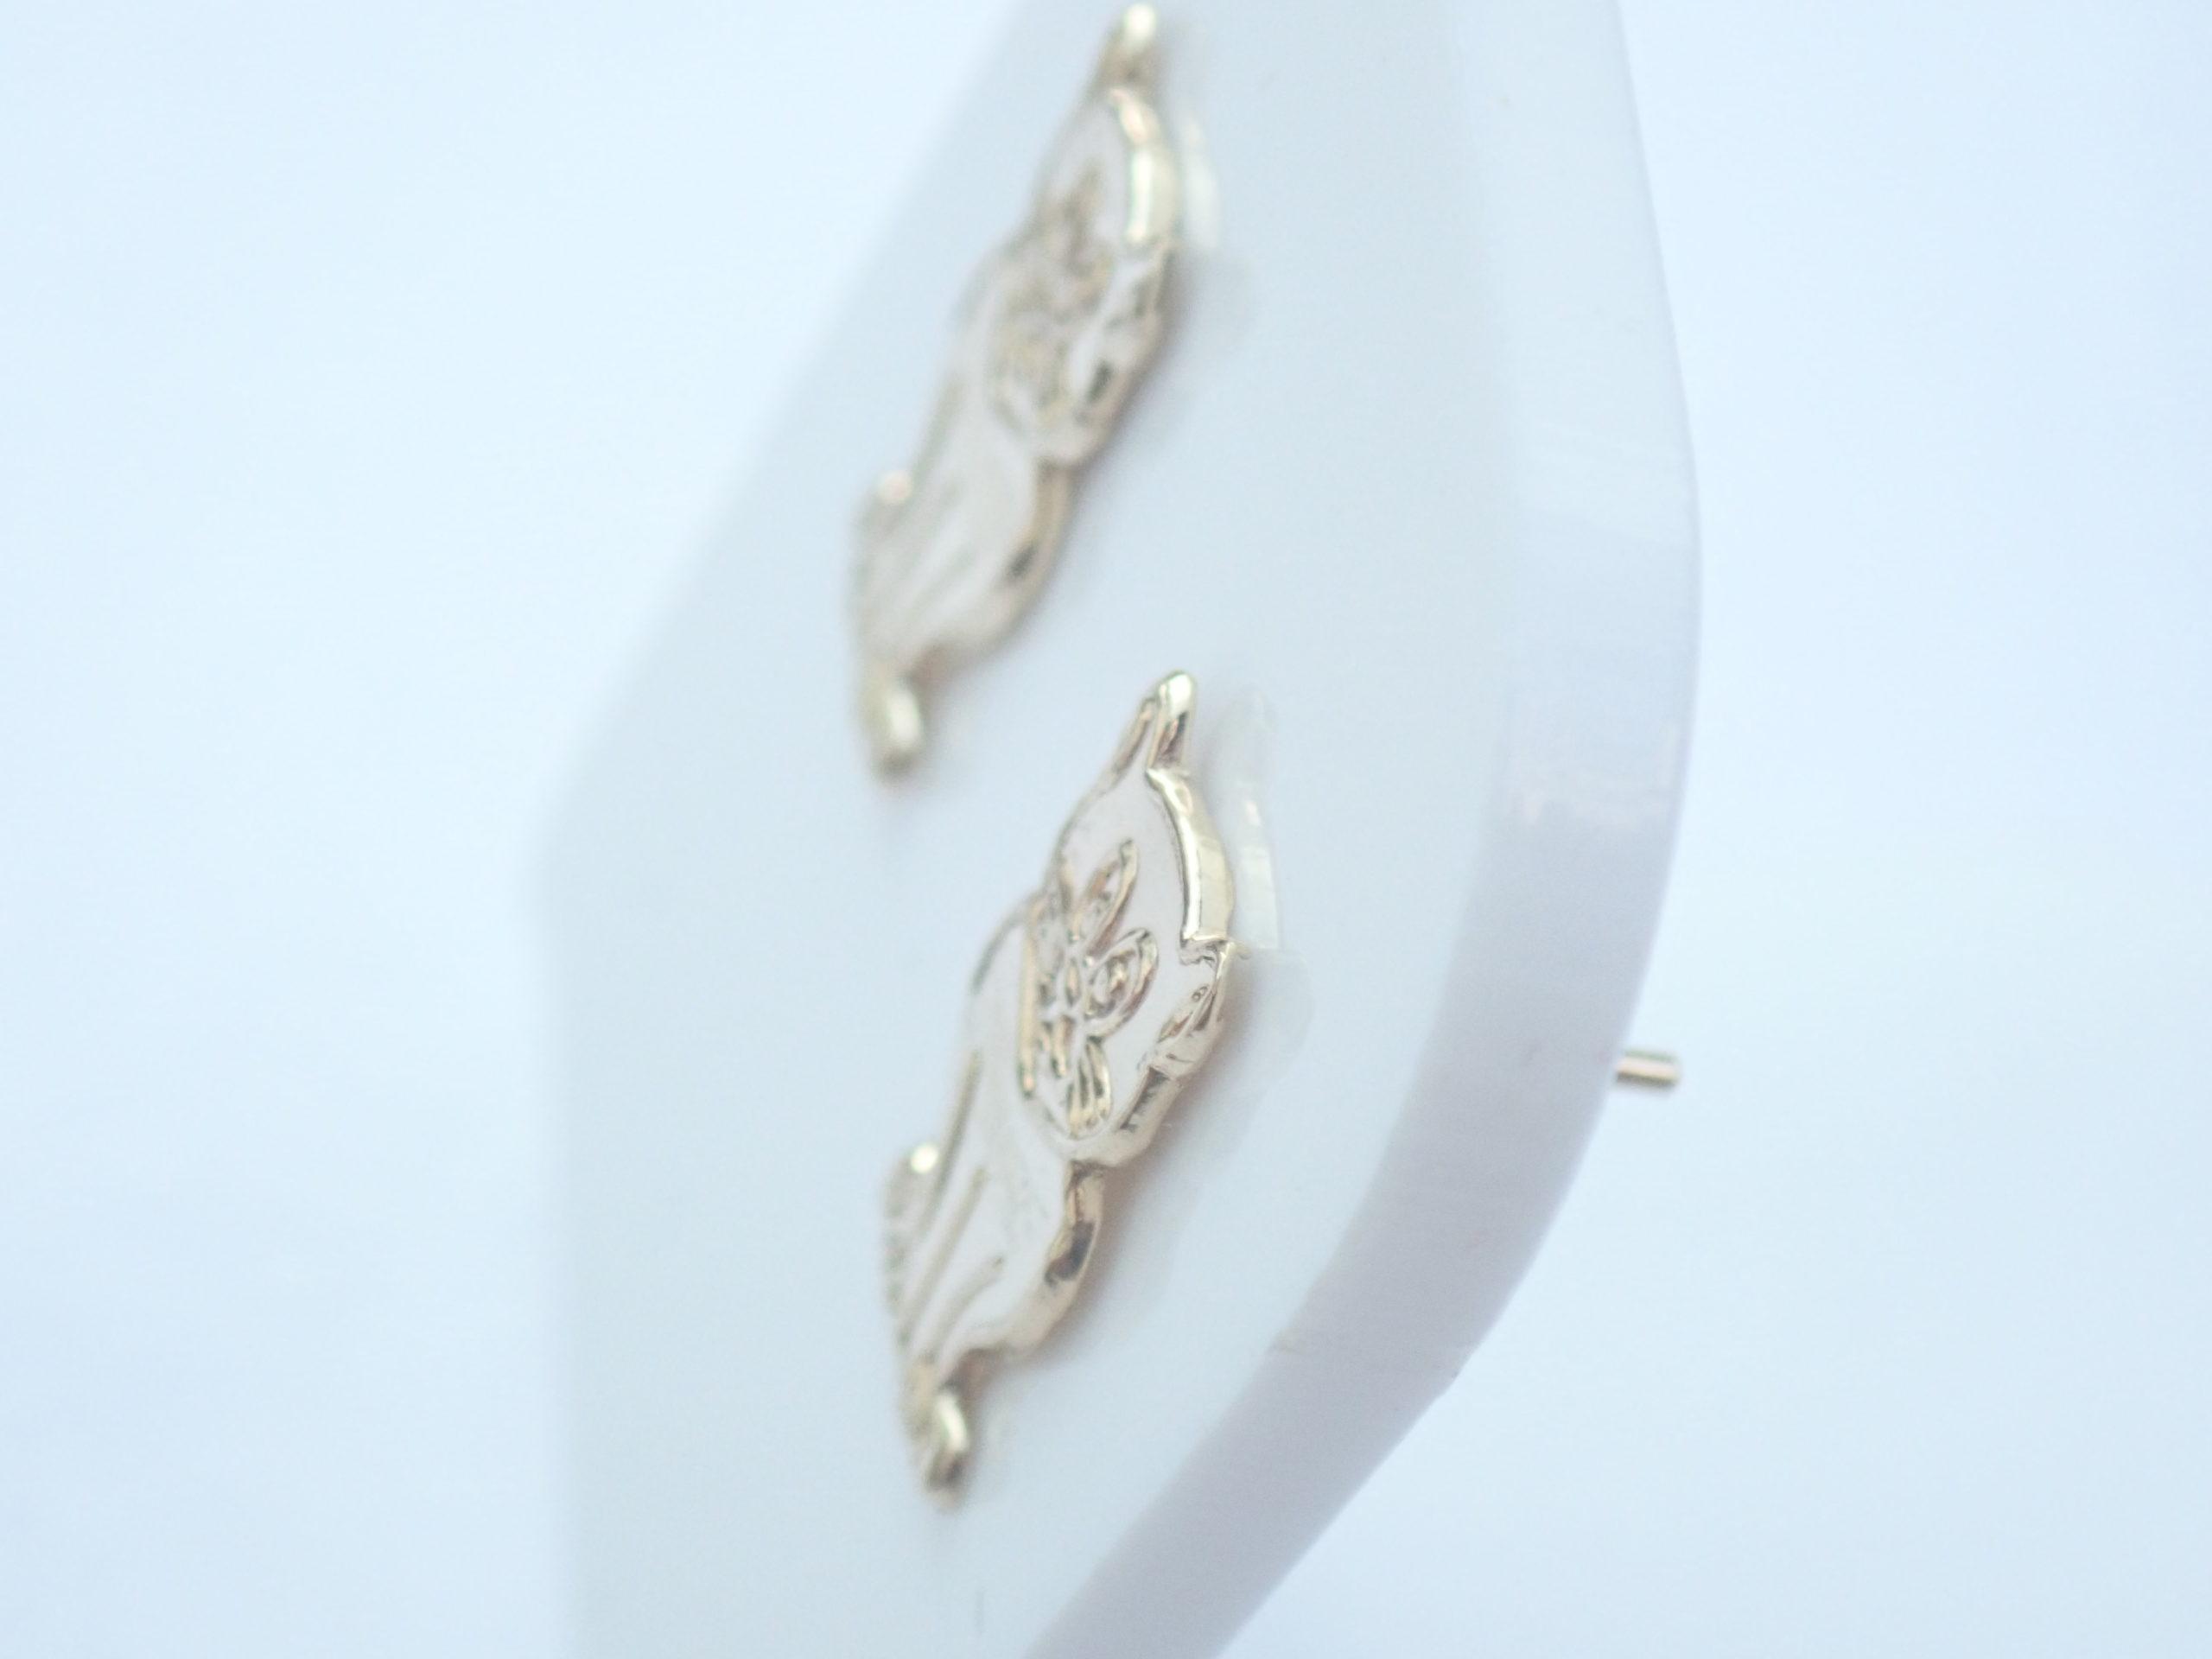 9k 375 Yellow Gold Sitting Cat Stud Earrings 0.5gms #8